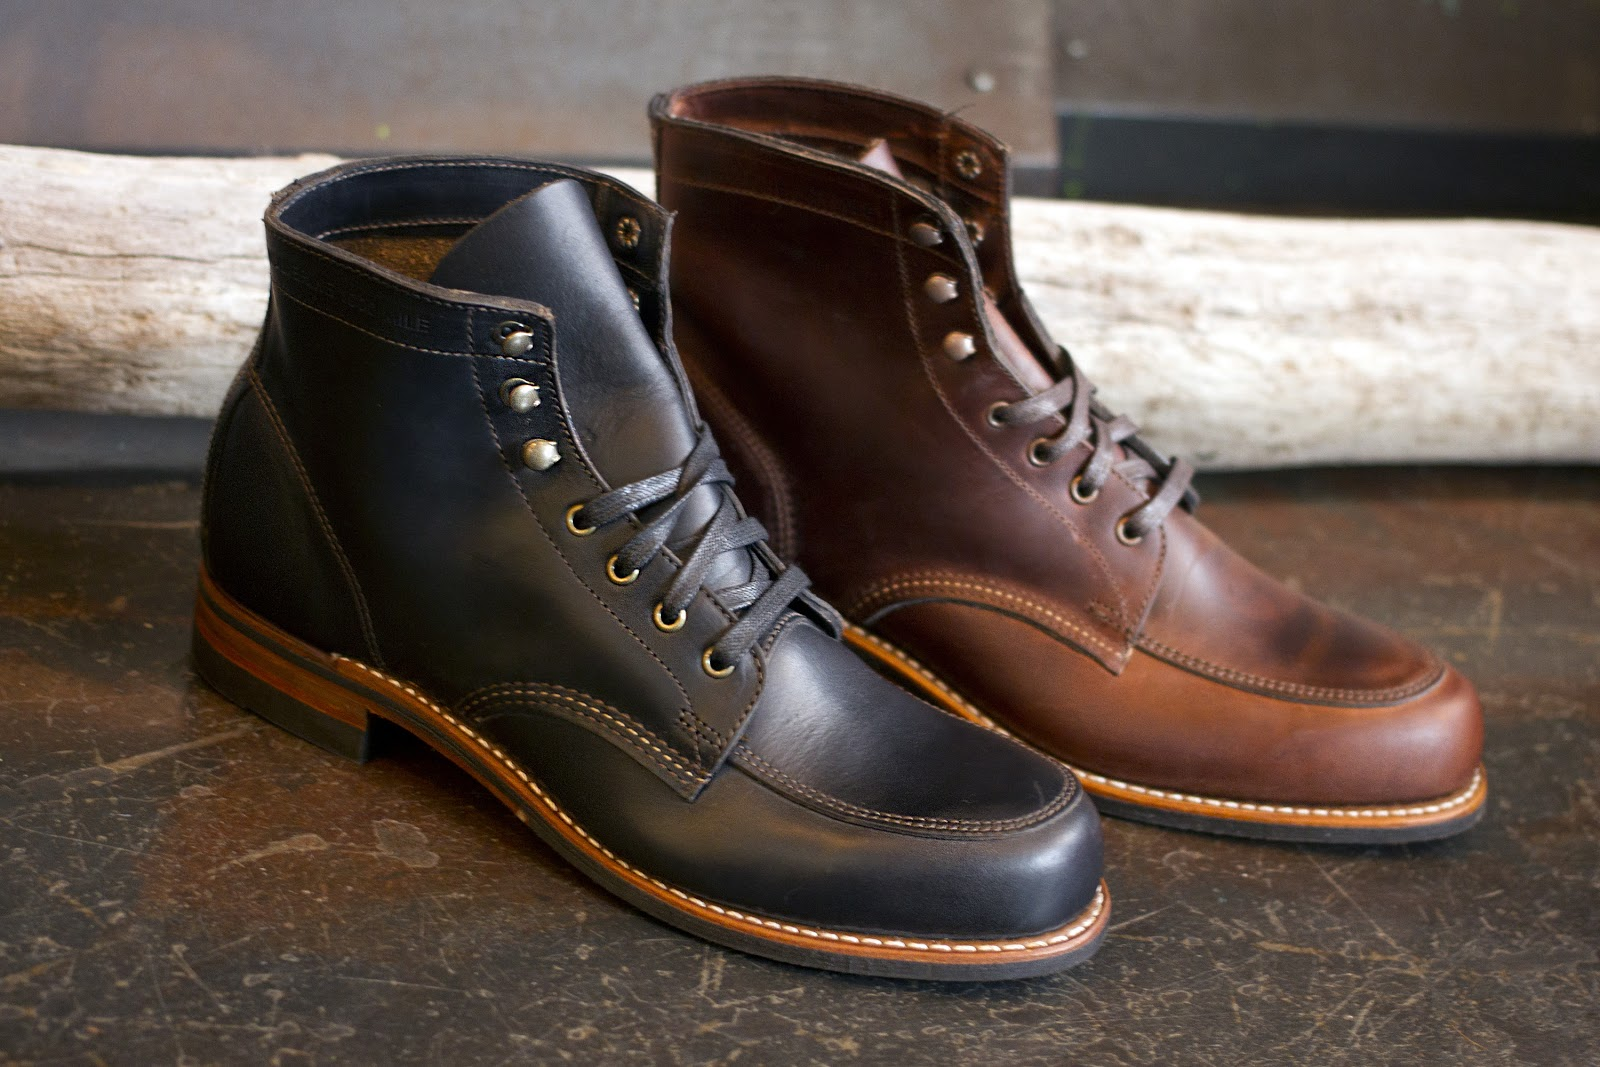 cb4c2956139 Piper's Shoe Parlor: November 2012